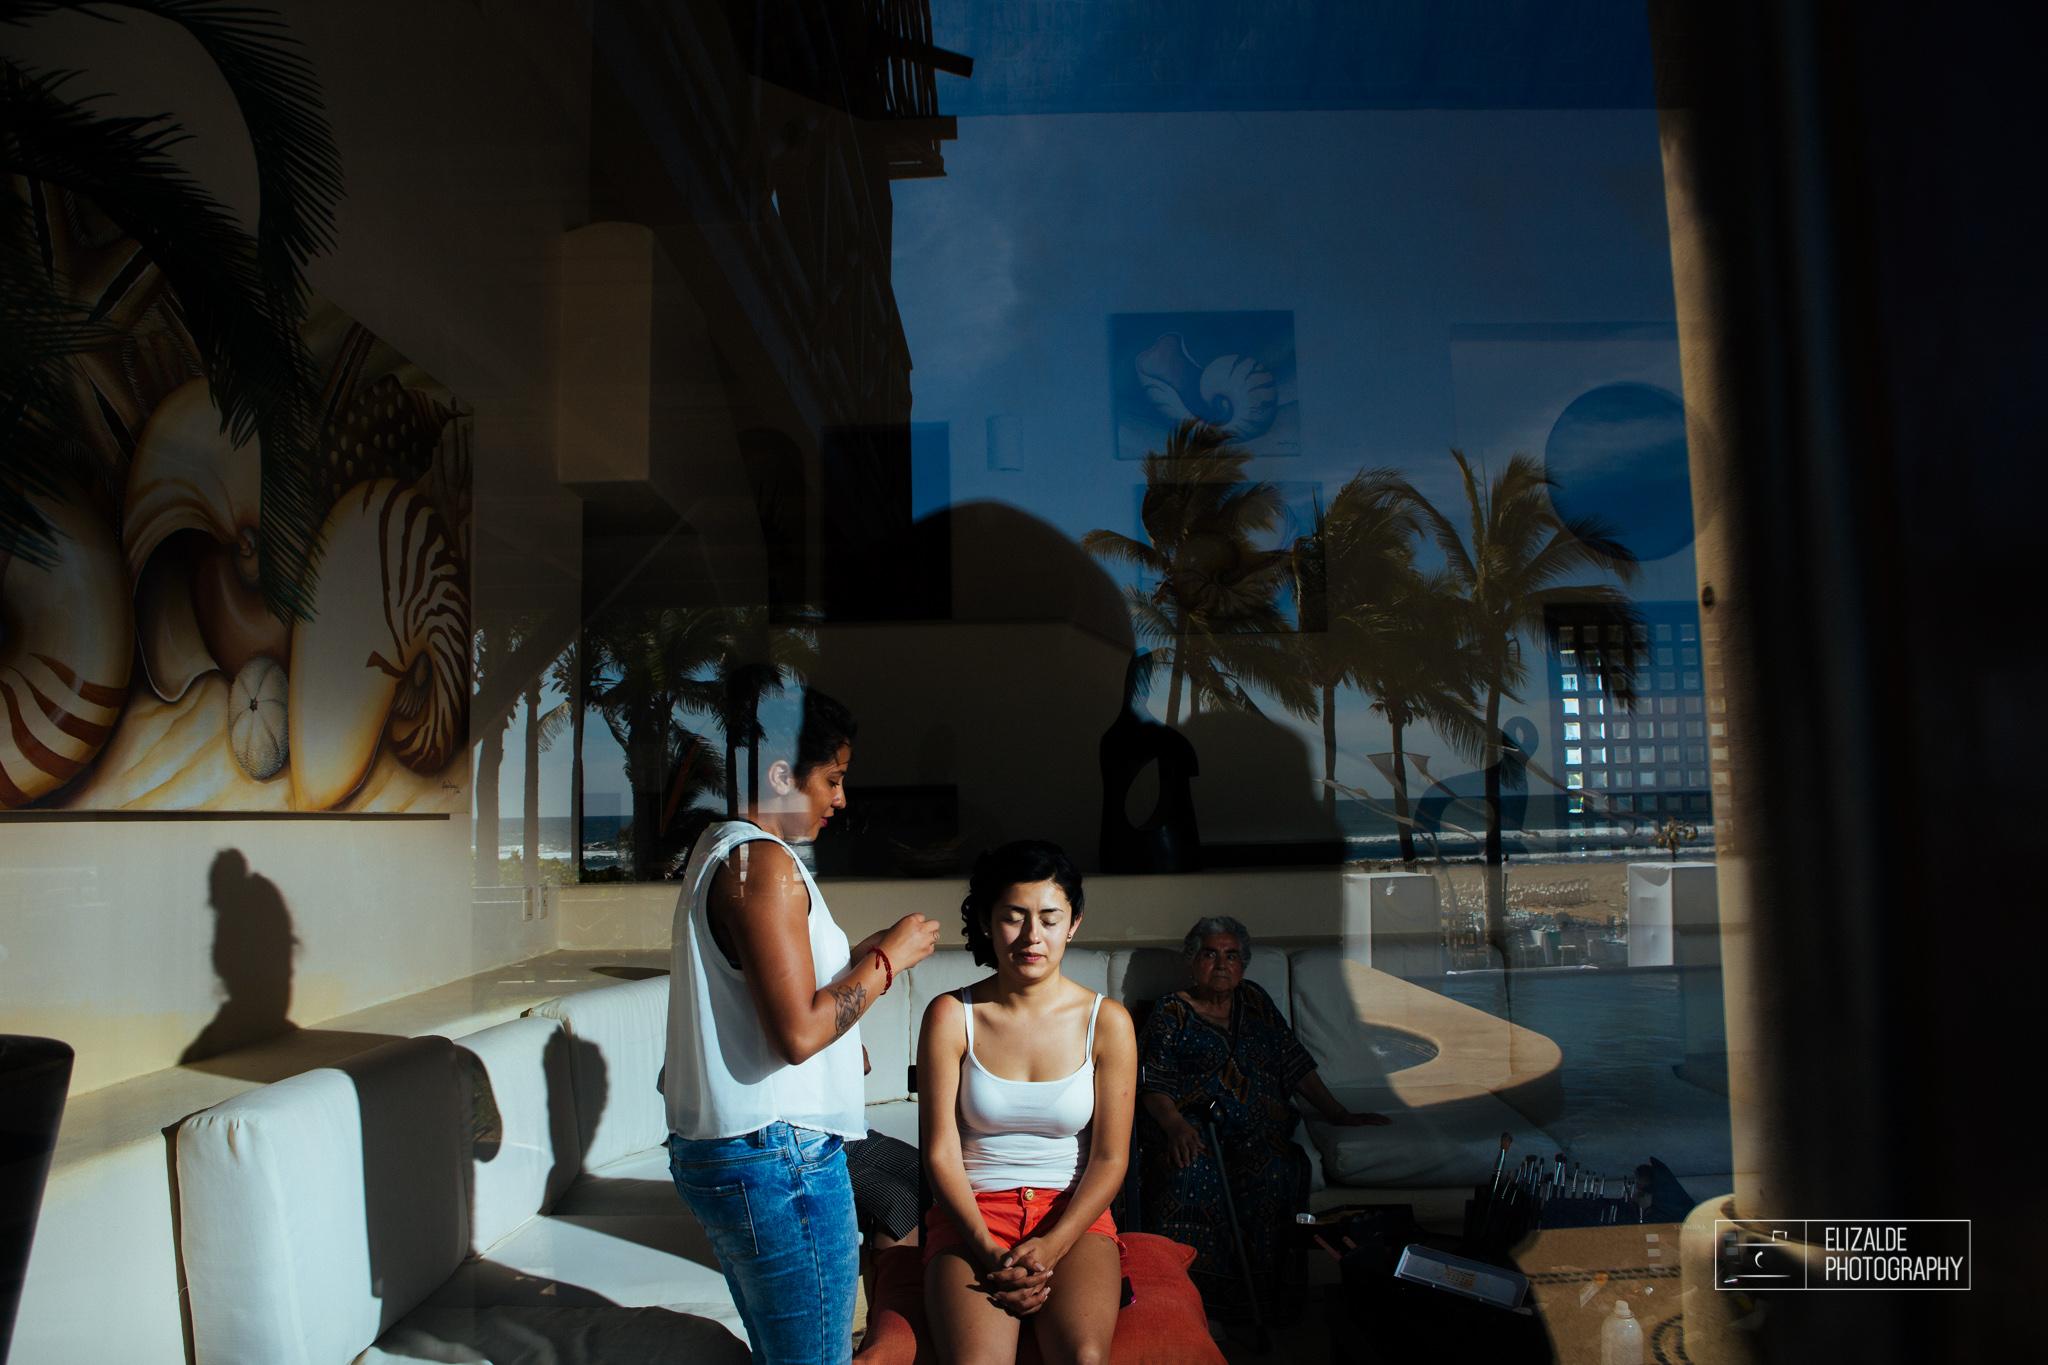 Pay and Ferran_Acapulco_Destination Wedding_Elizalde Photography-17.jpg